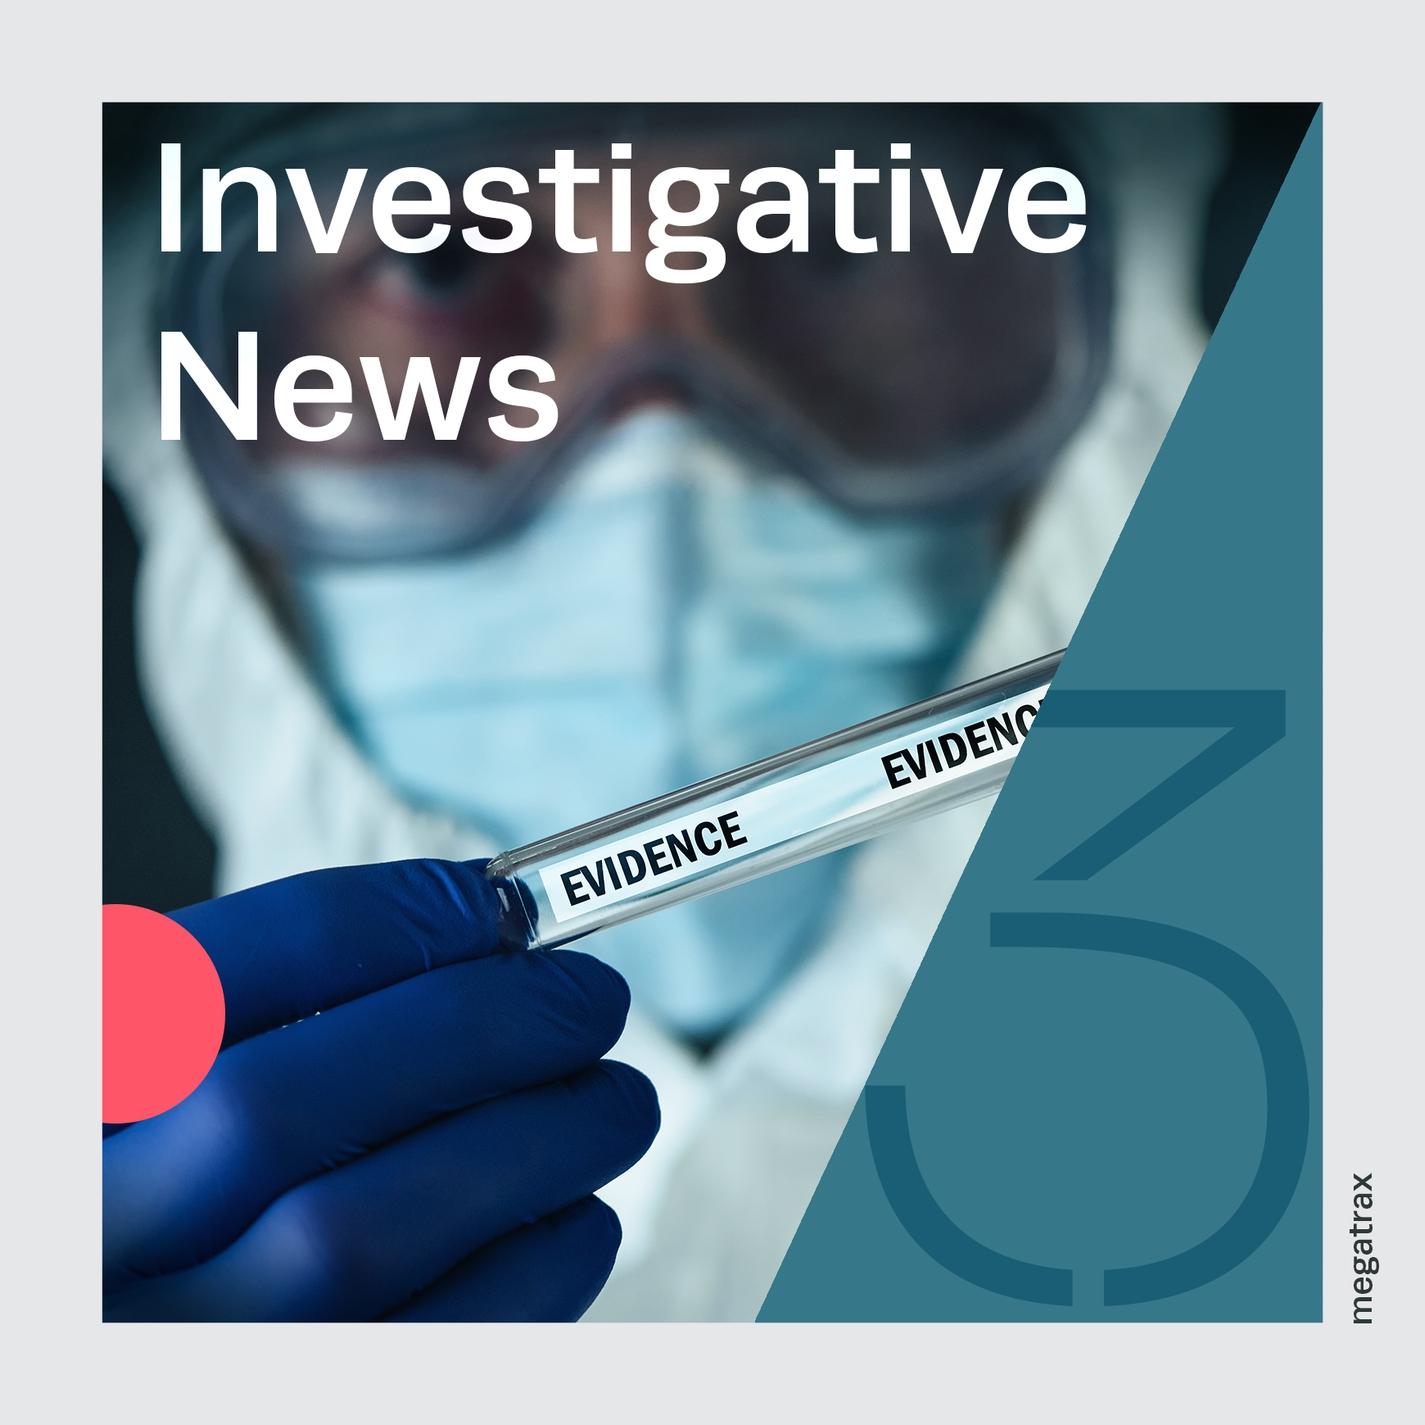 Investigative News 3